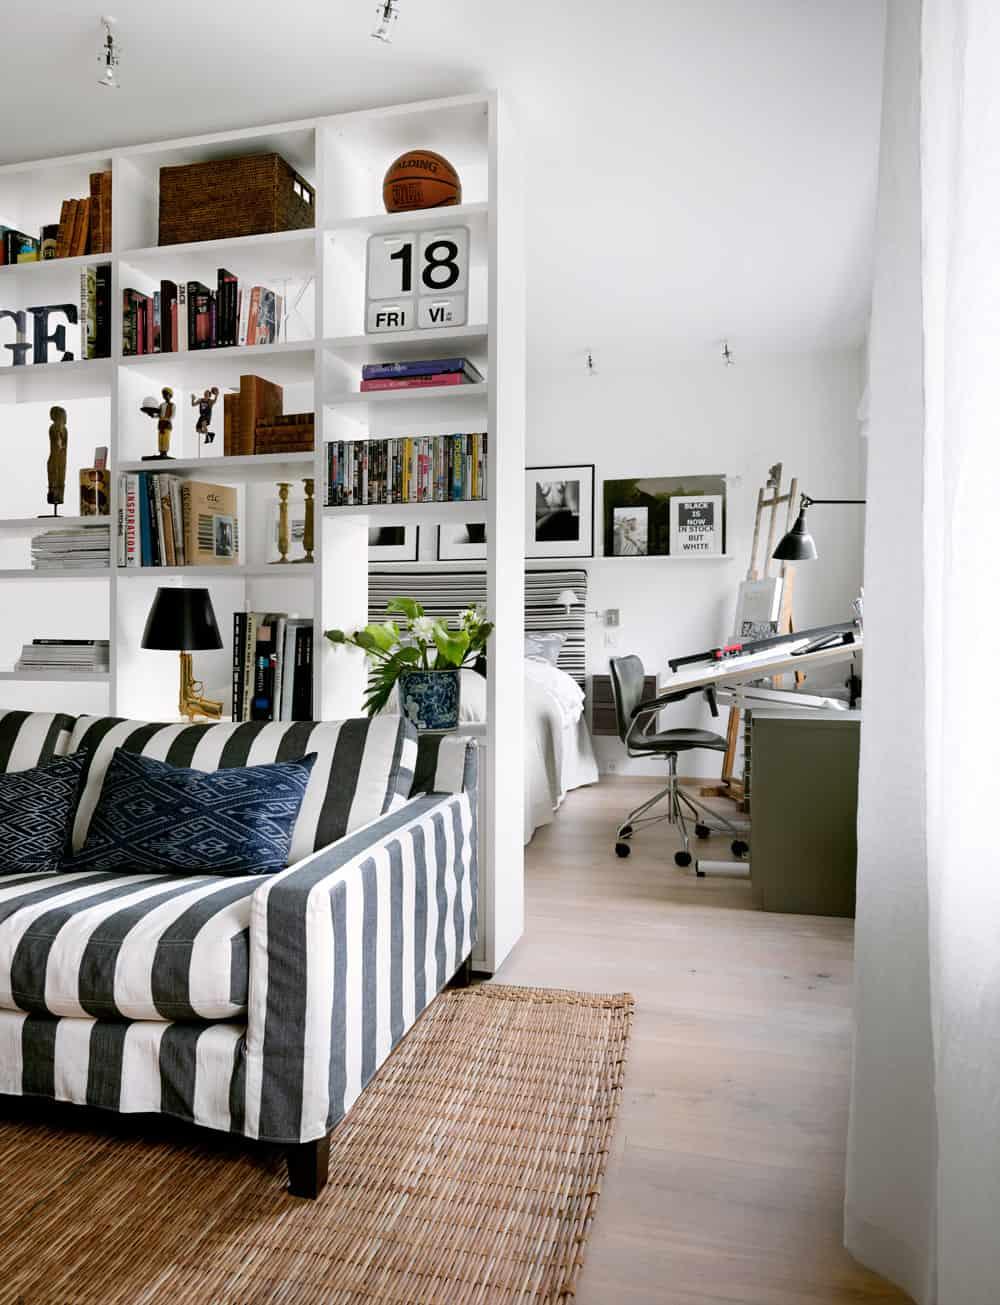 Shelving-divided bedroom